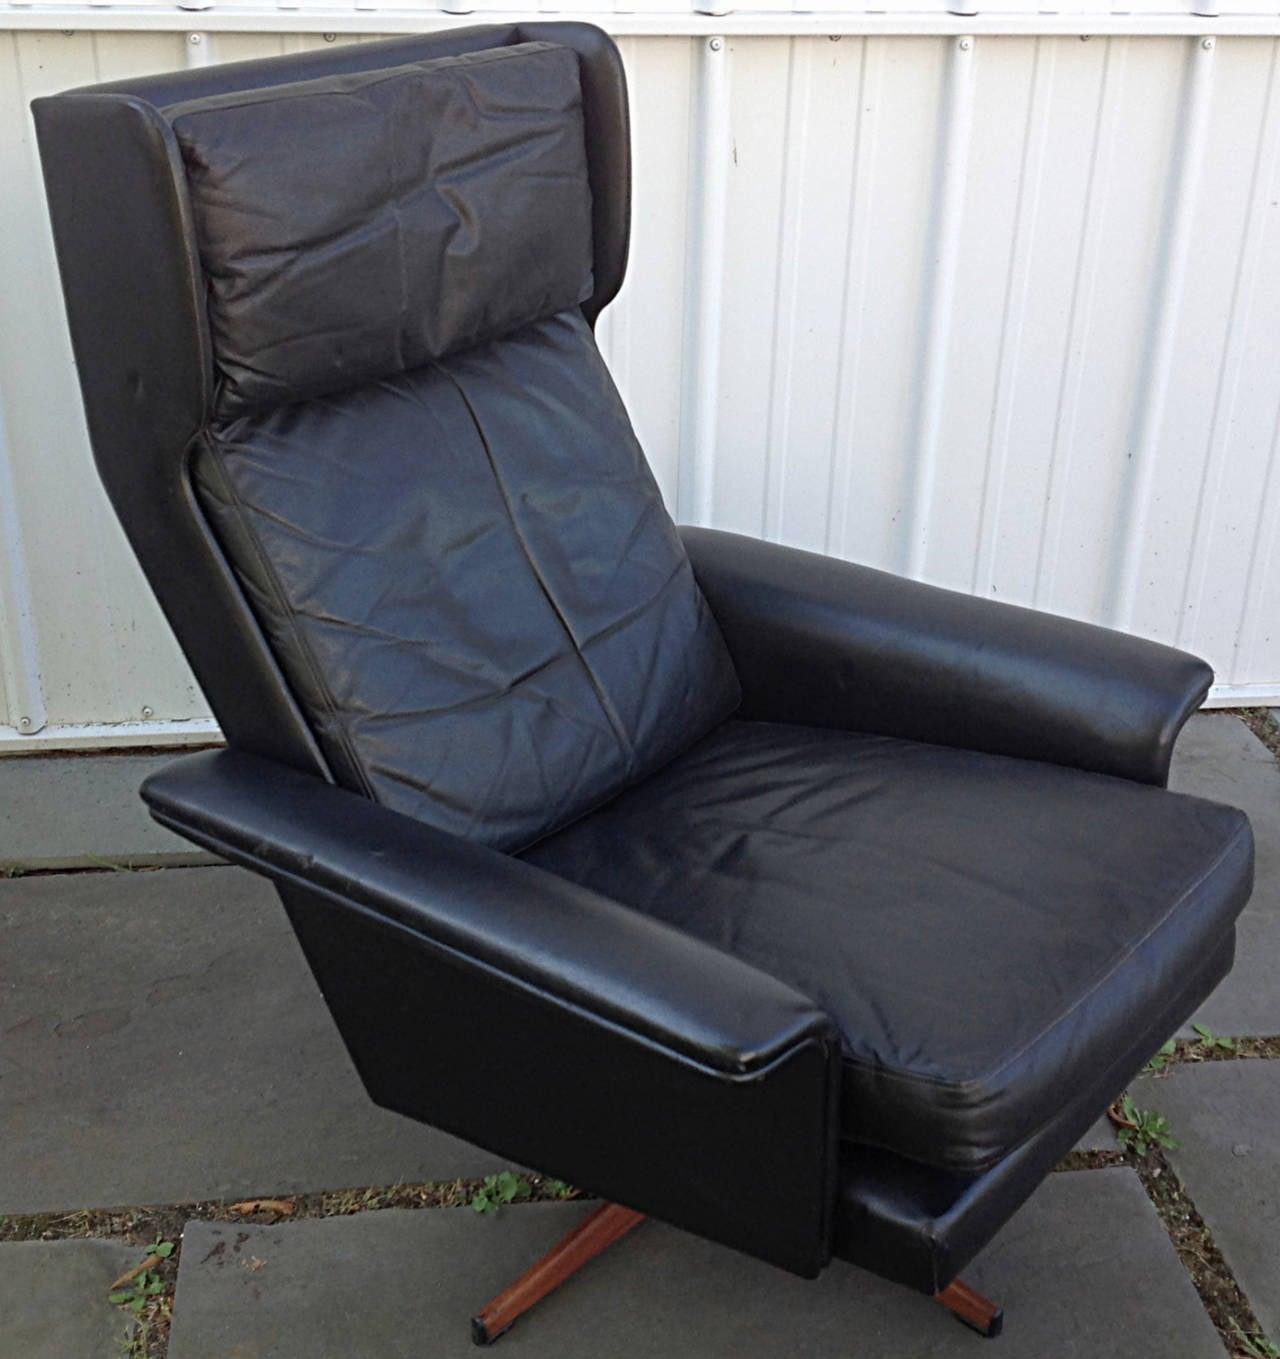 black leather wingback chair lightweight folding beach lounge swivel by komfort at 1stdibs